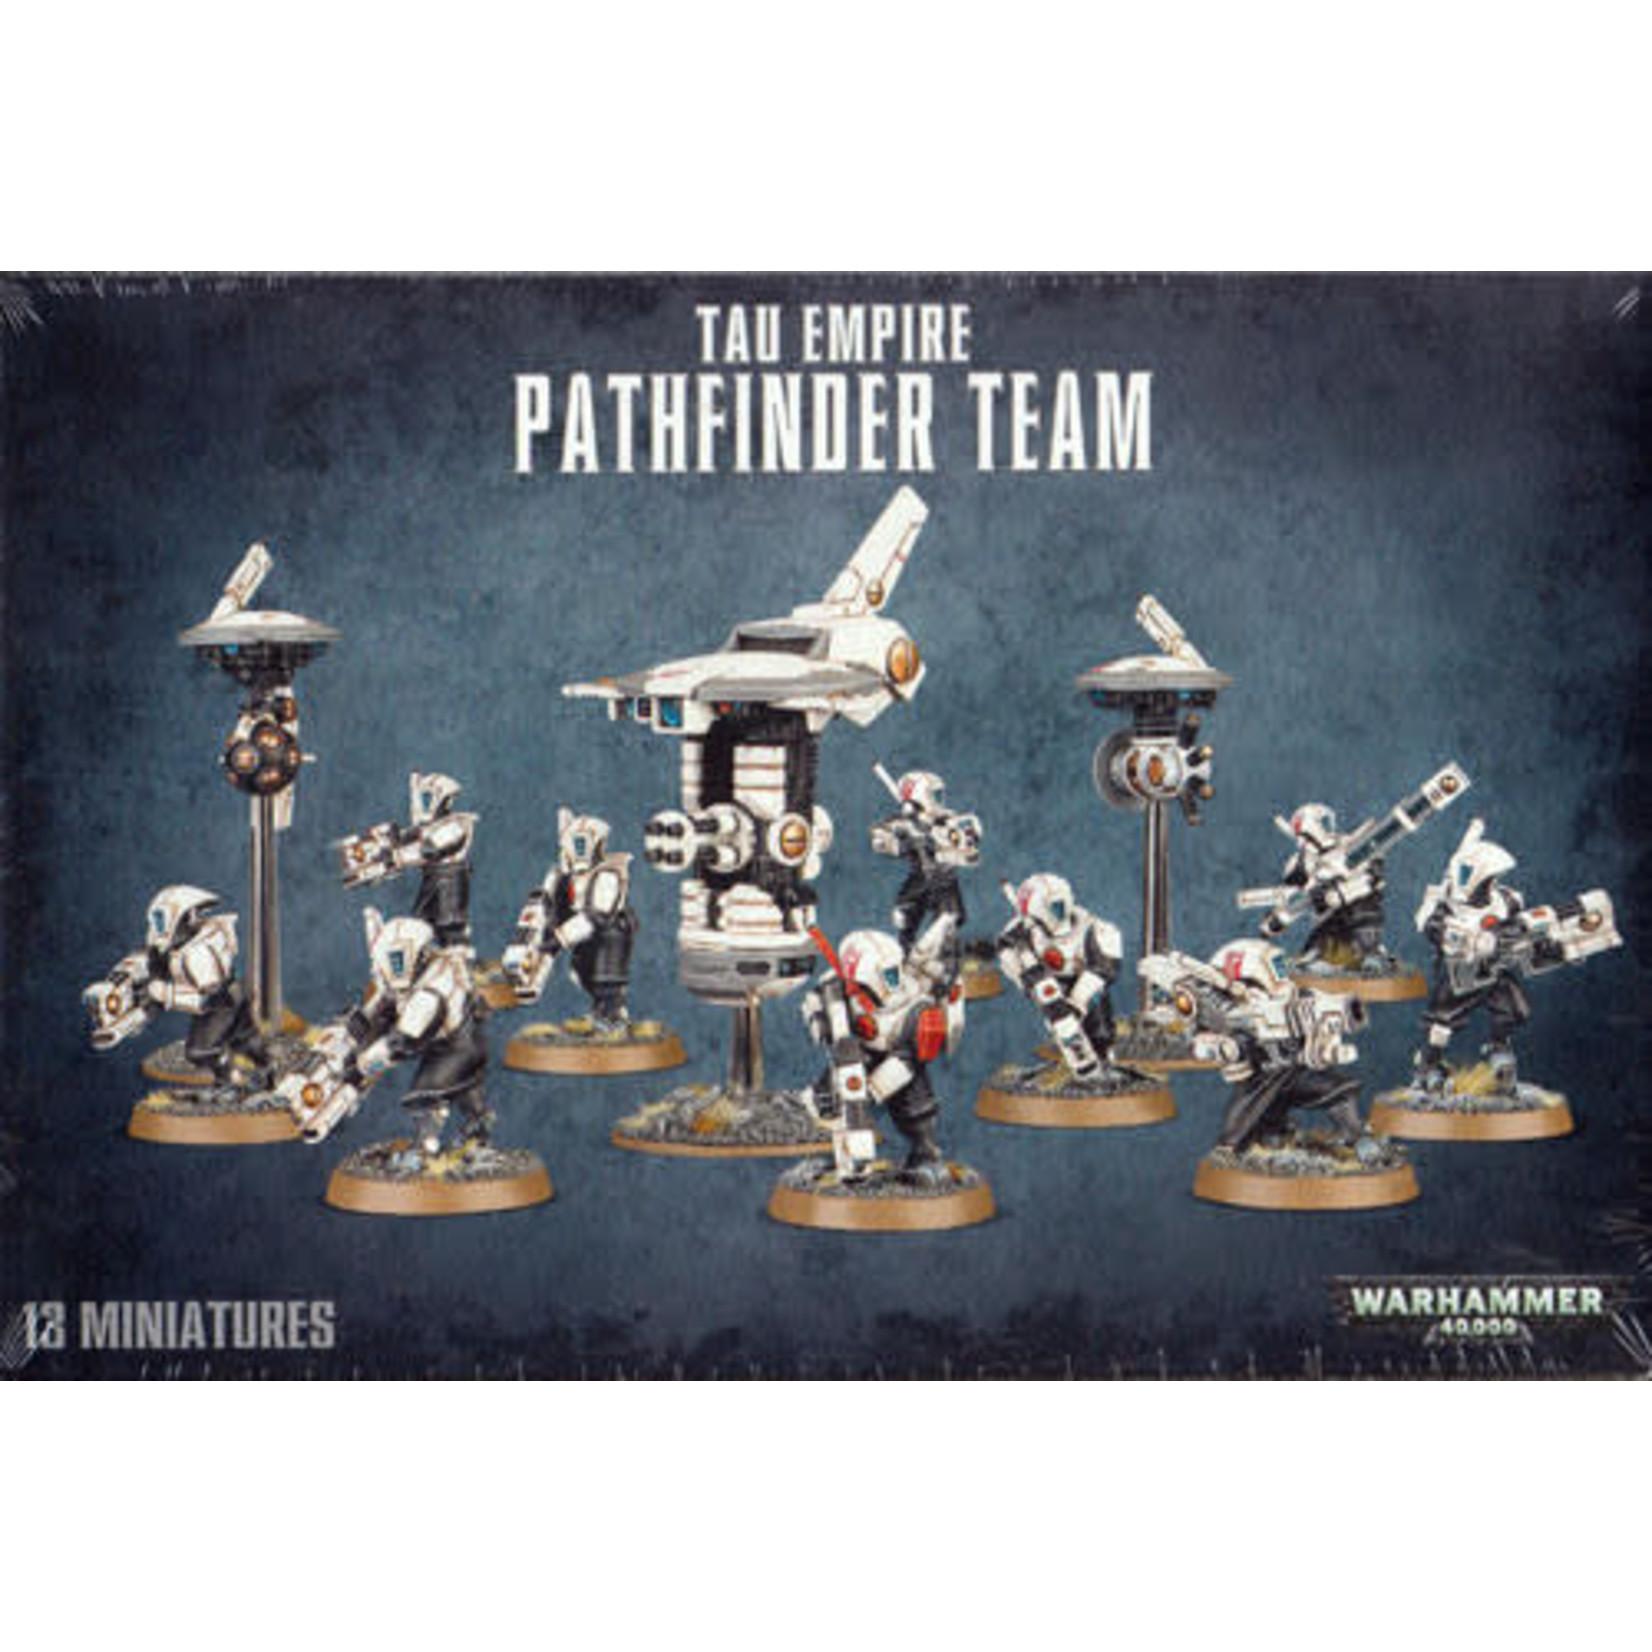 Tau Empire Pathfinder Team (40K)